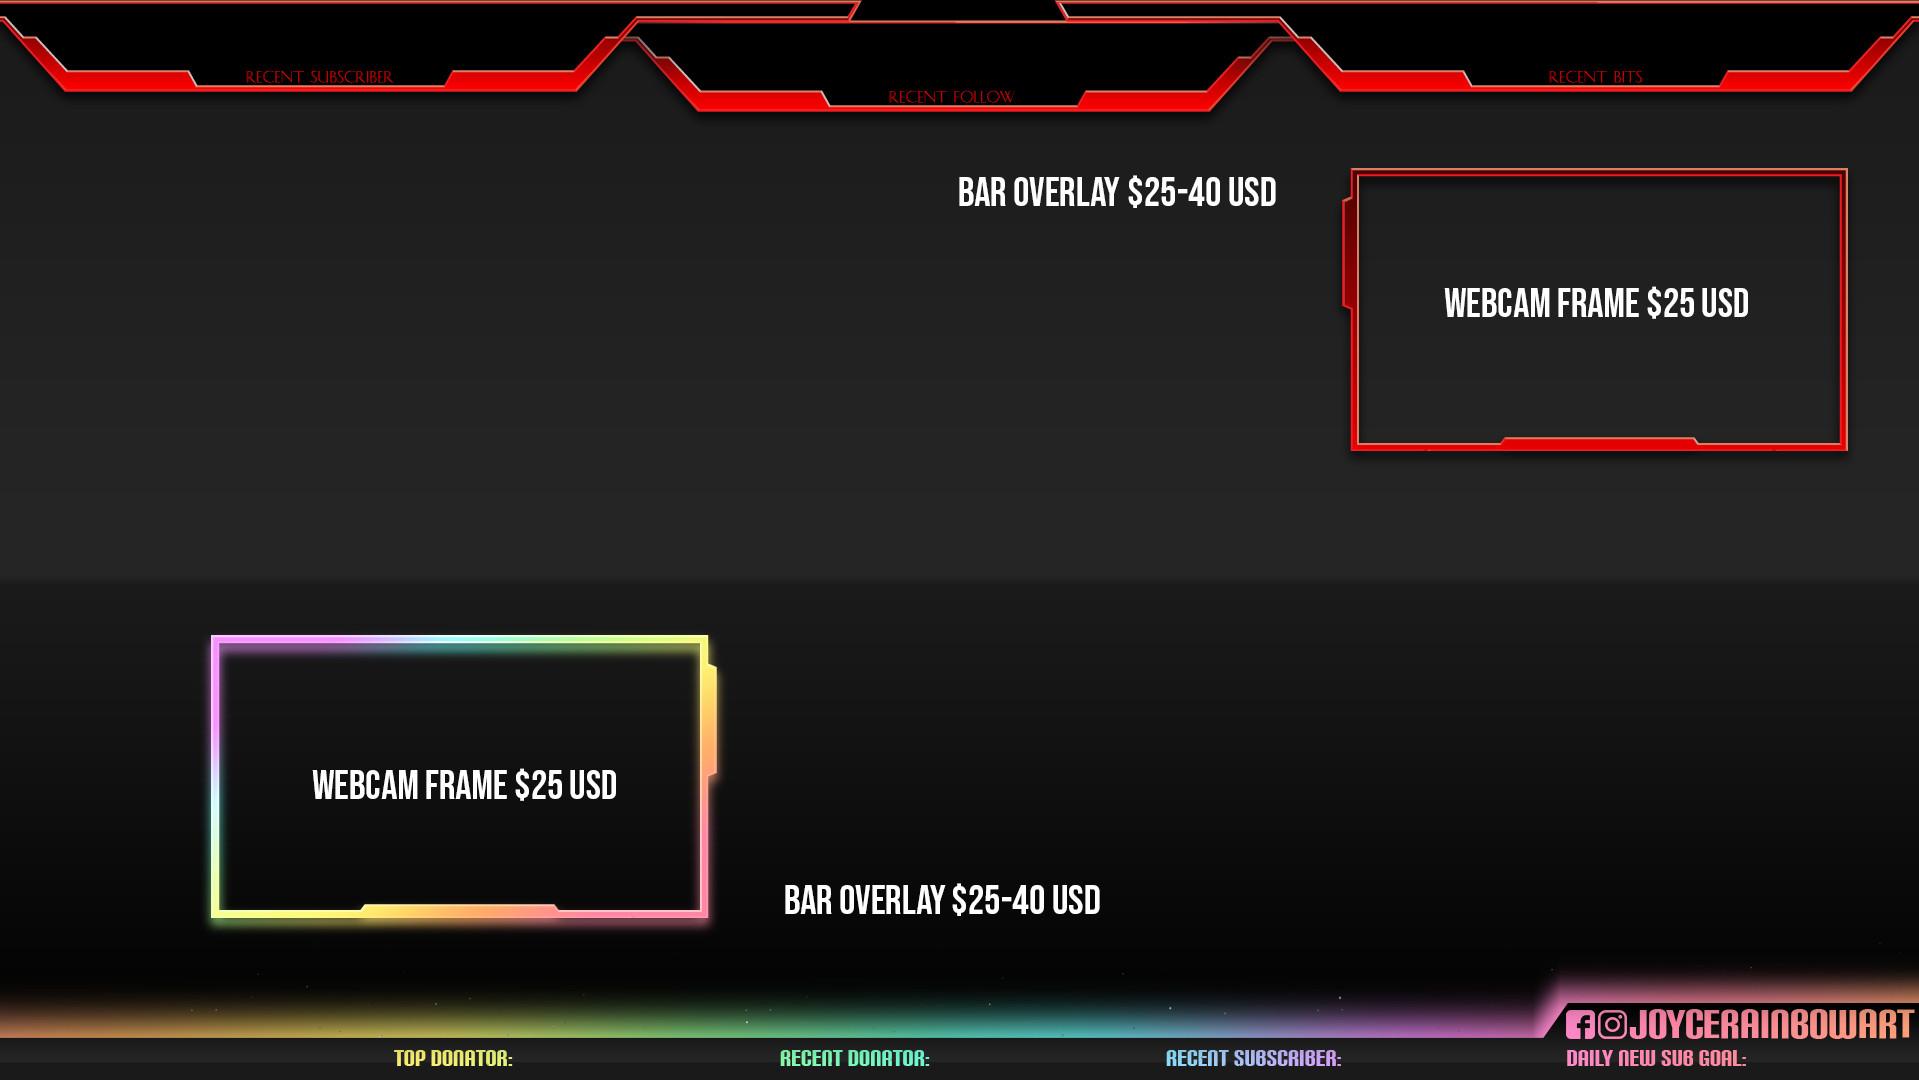 Bar and Frame Overlays